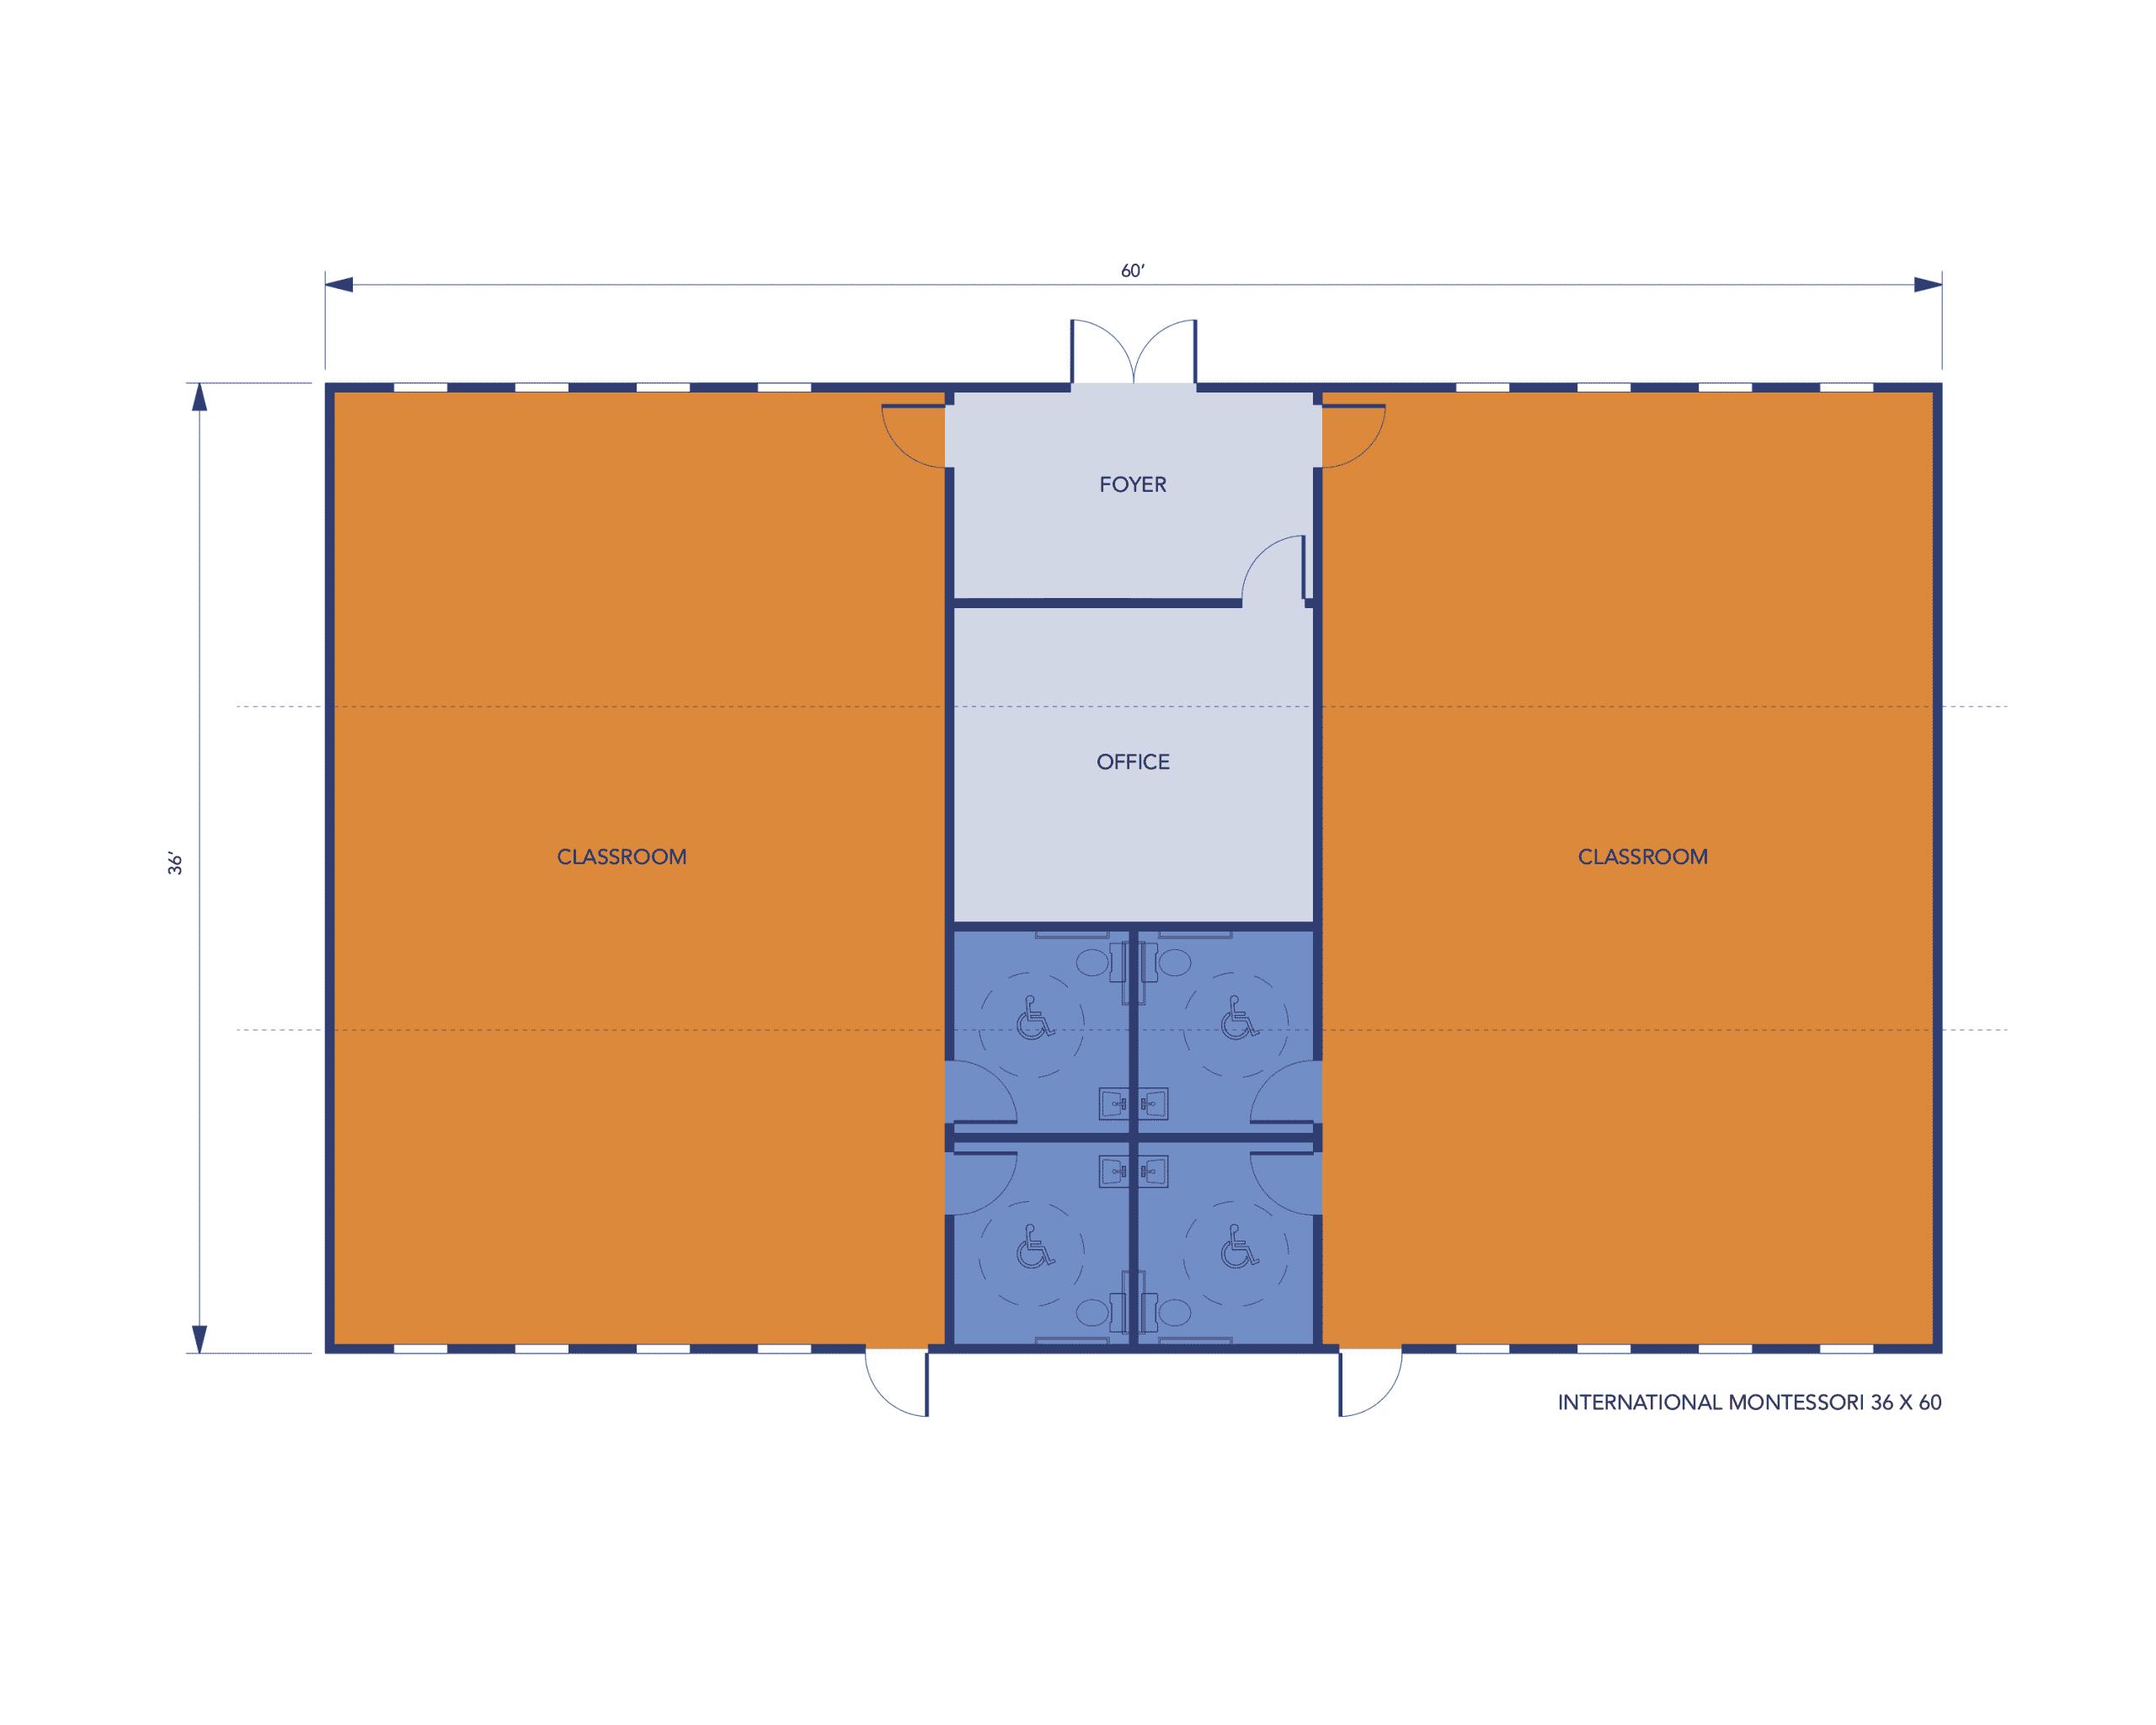 Multi-Classroom Modular Classroom Layout